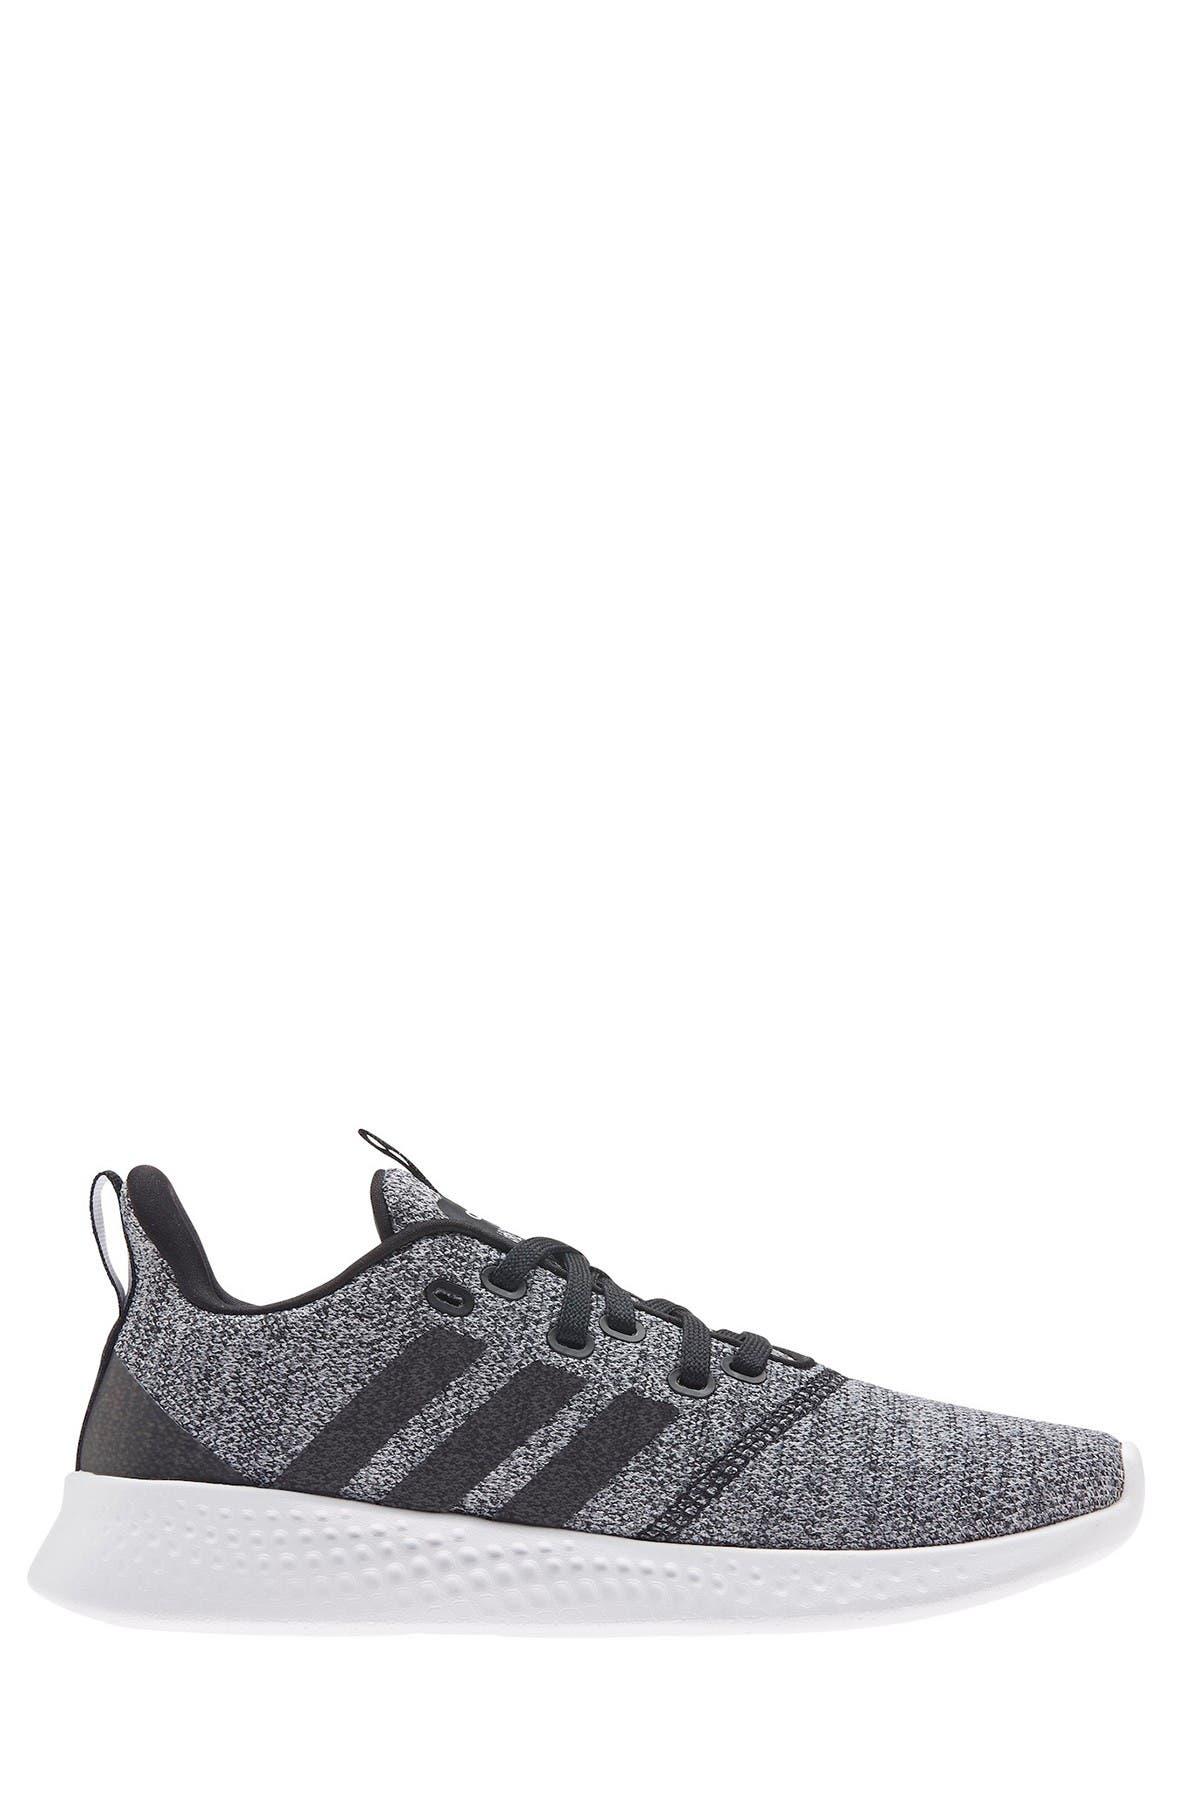 Image of adidas Puremotion Sneaker